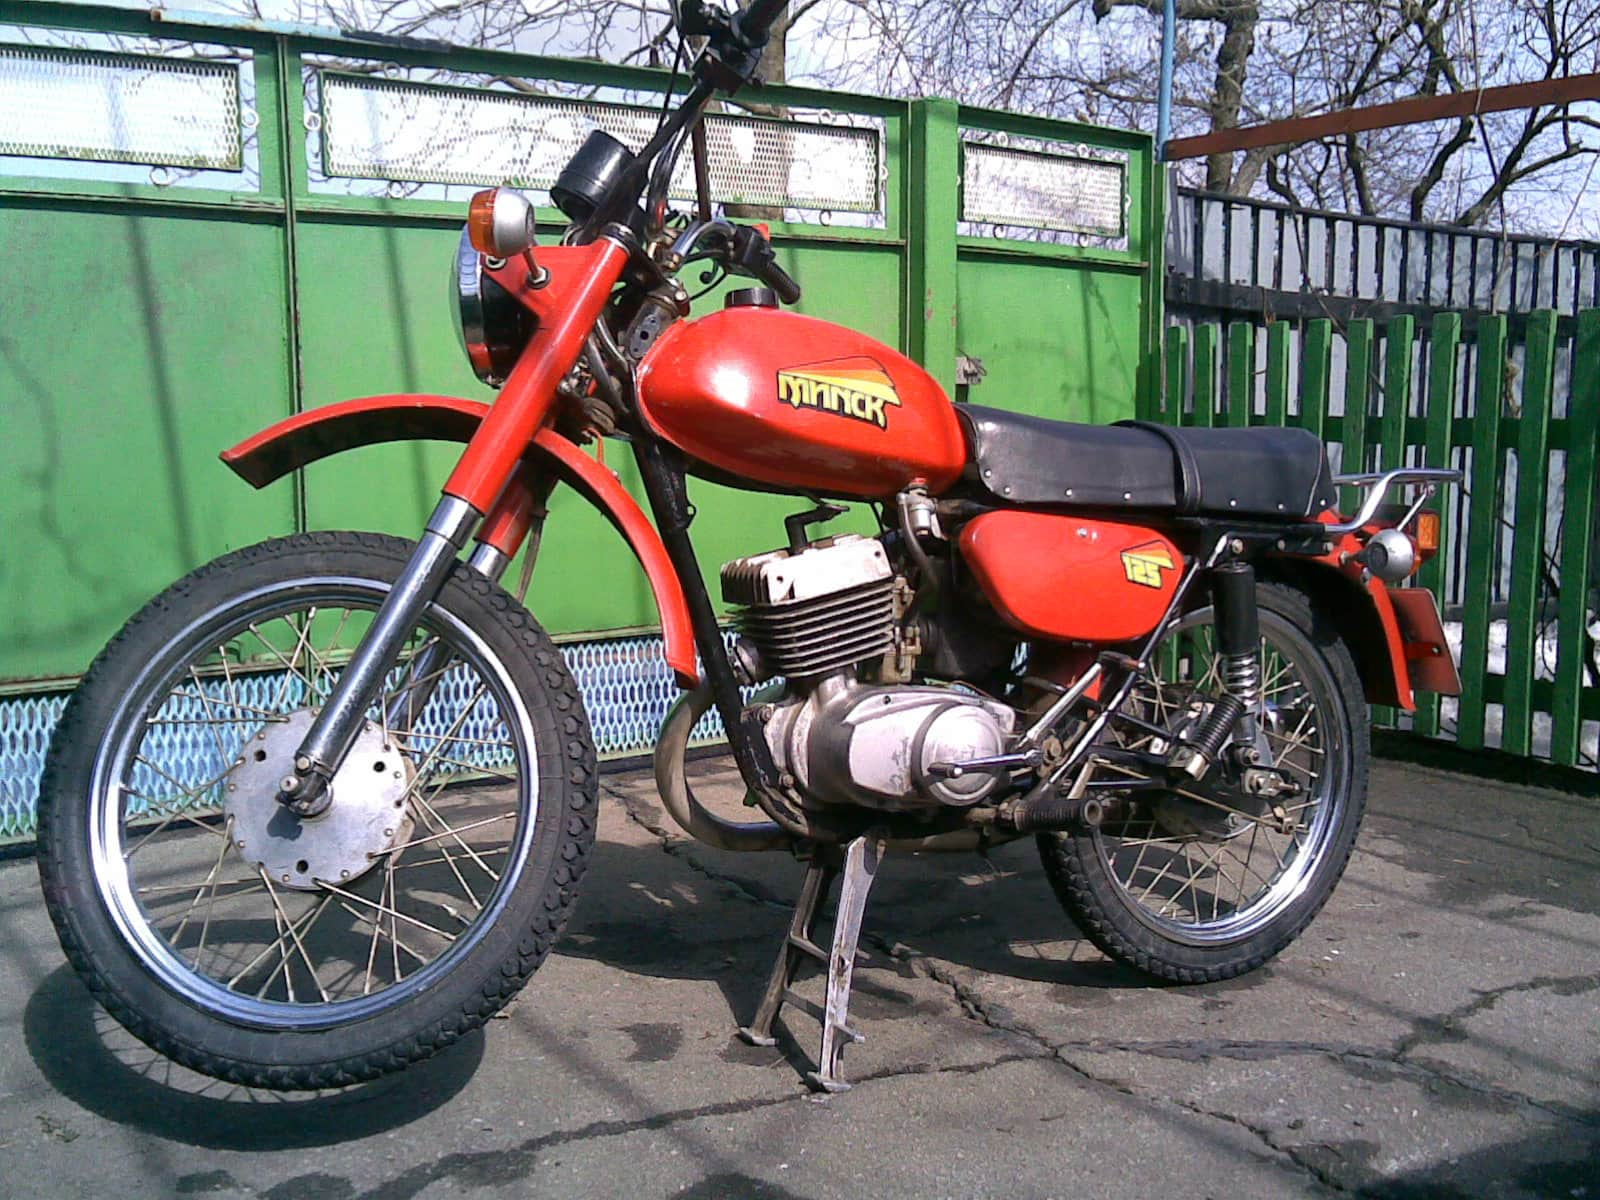 Мотоцикл днепр турист фото свомпи полное